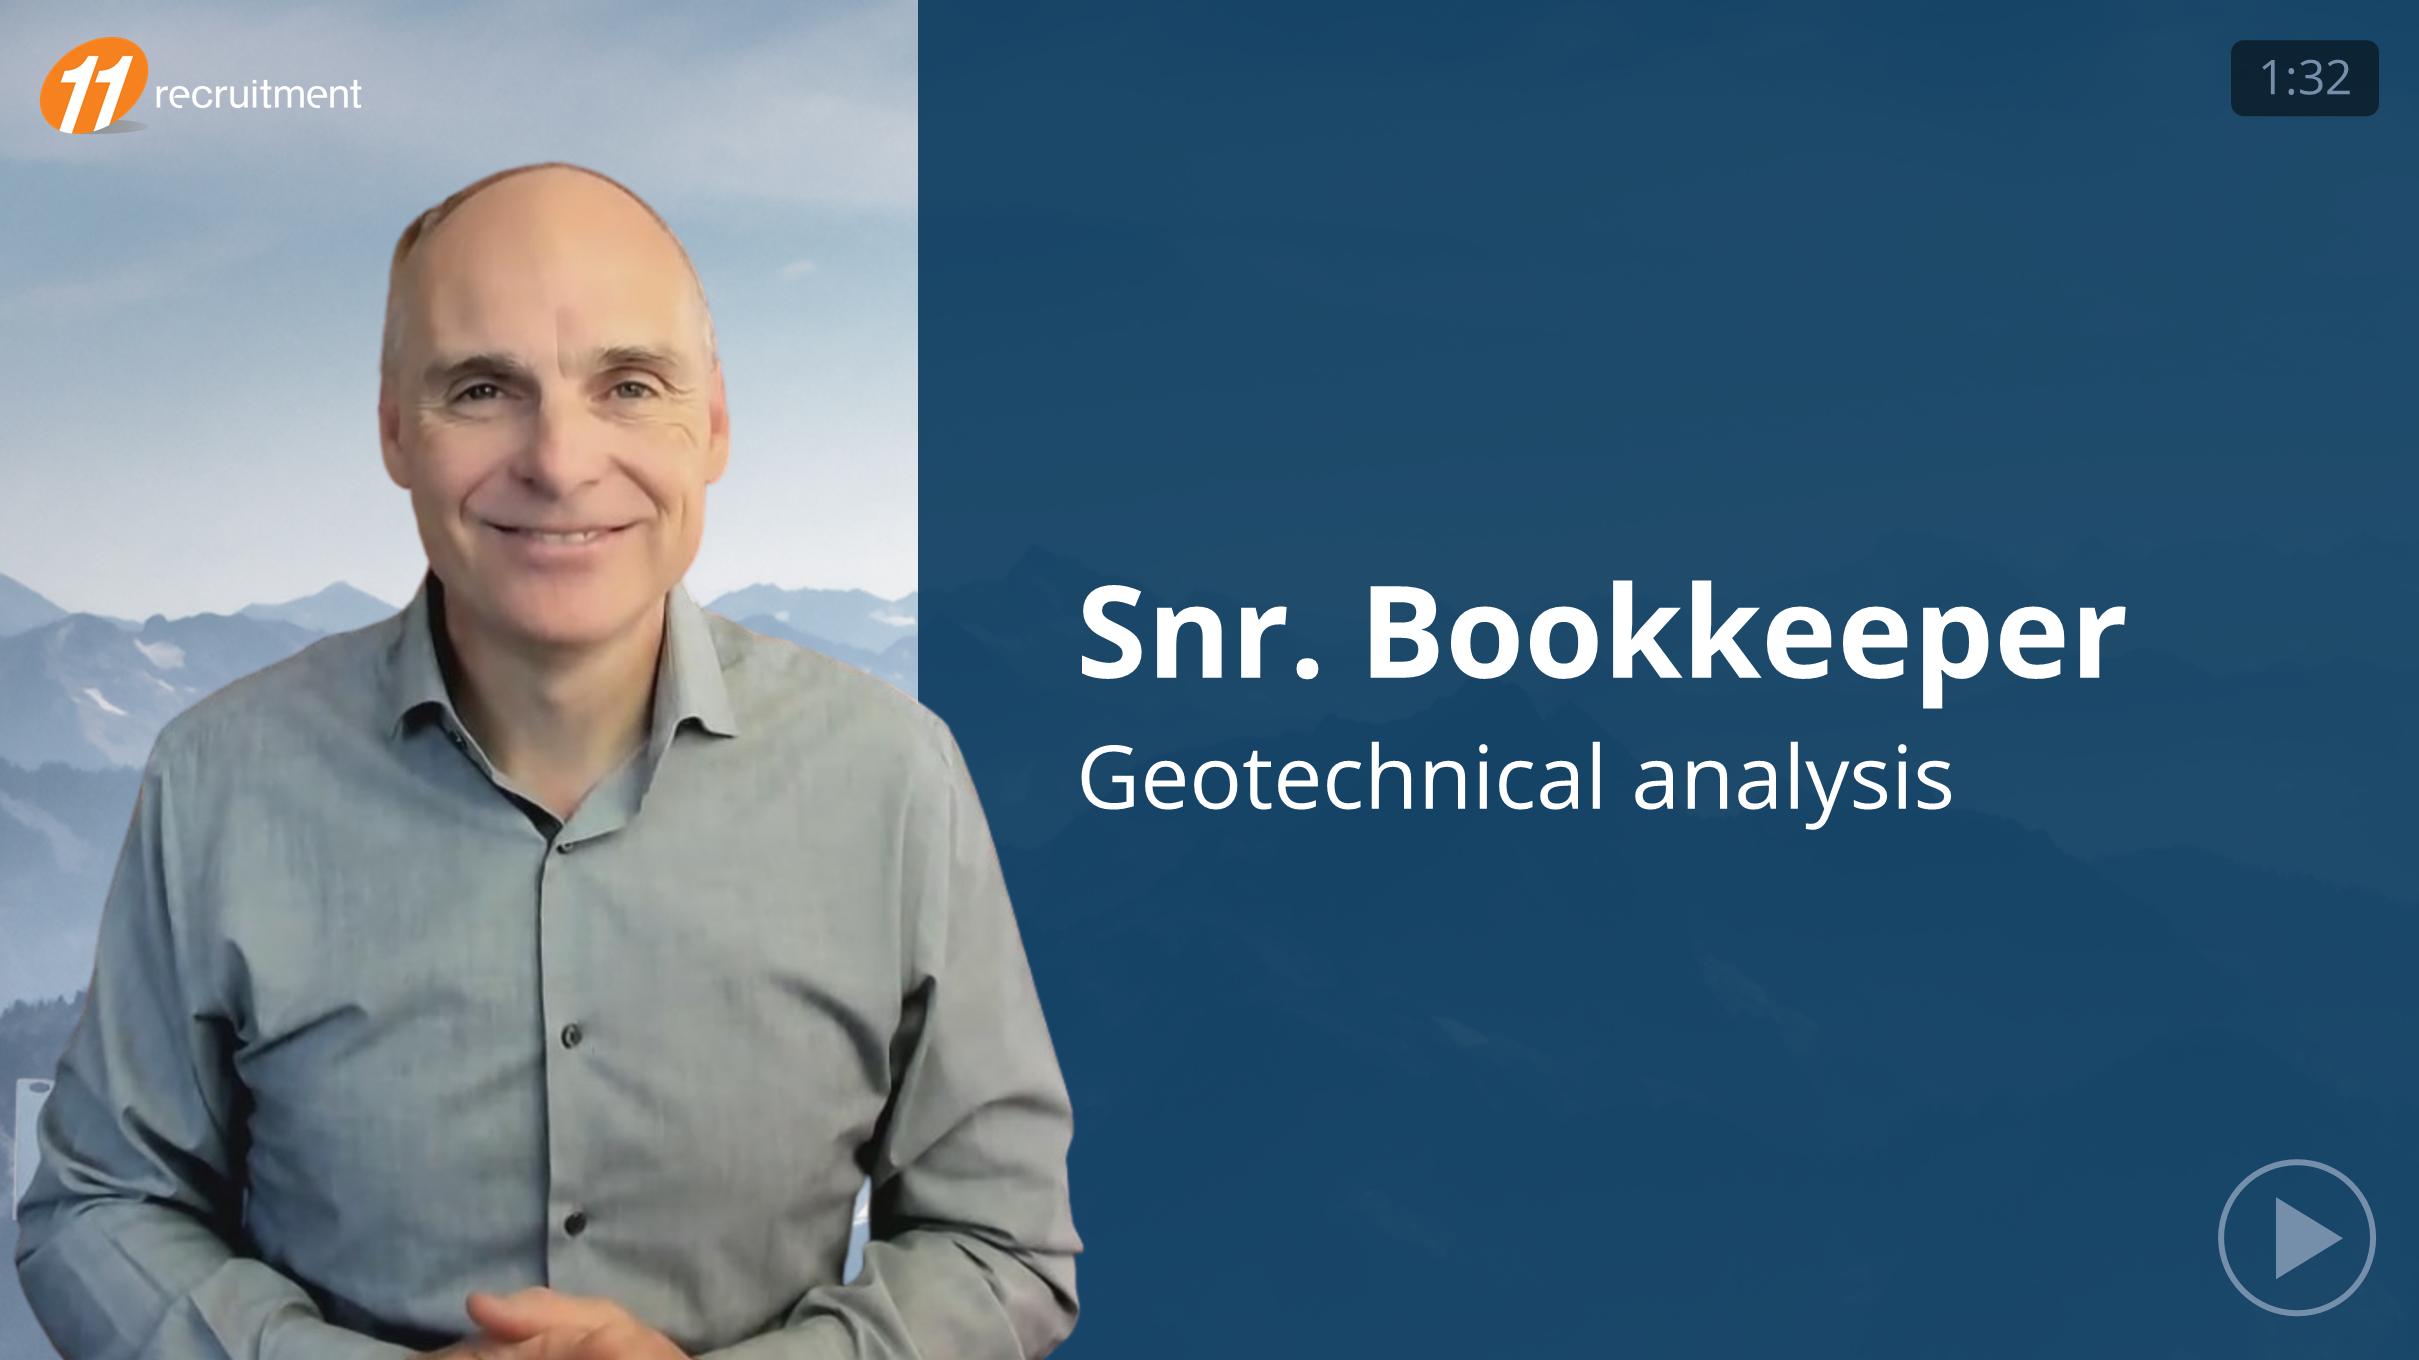 Senior Bookkeeper - Geotechnical